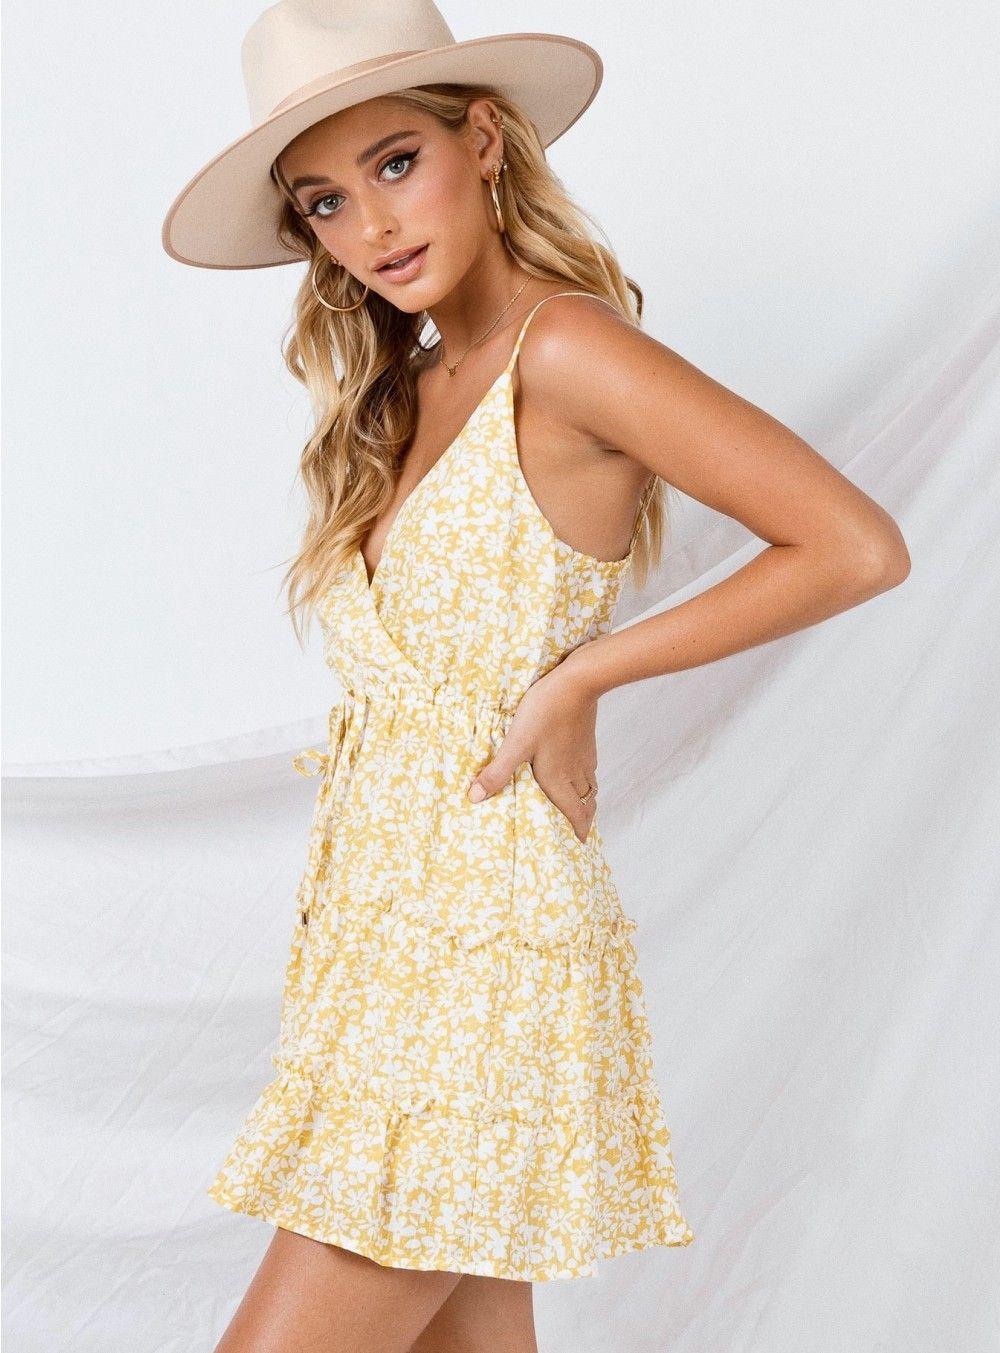 Alleste Mini Dress Yellow Dresses Cute Summer Dresses Mini Dress [ 1353 x 1000 Pixel ]